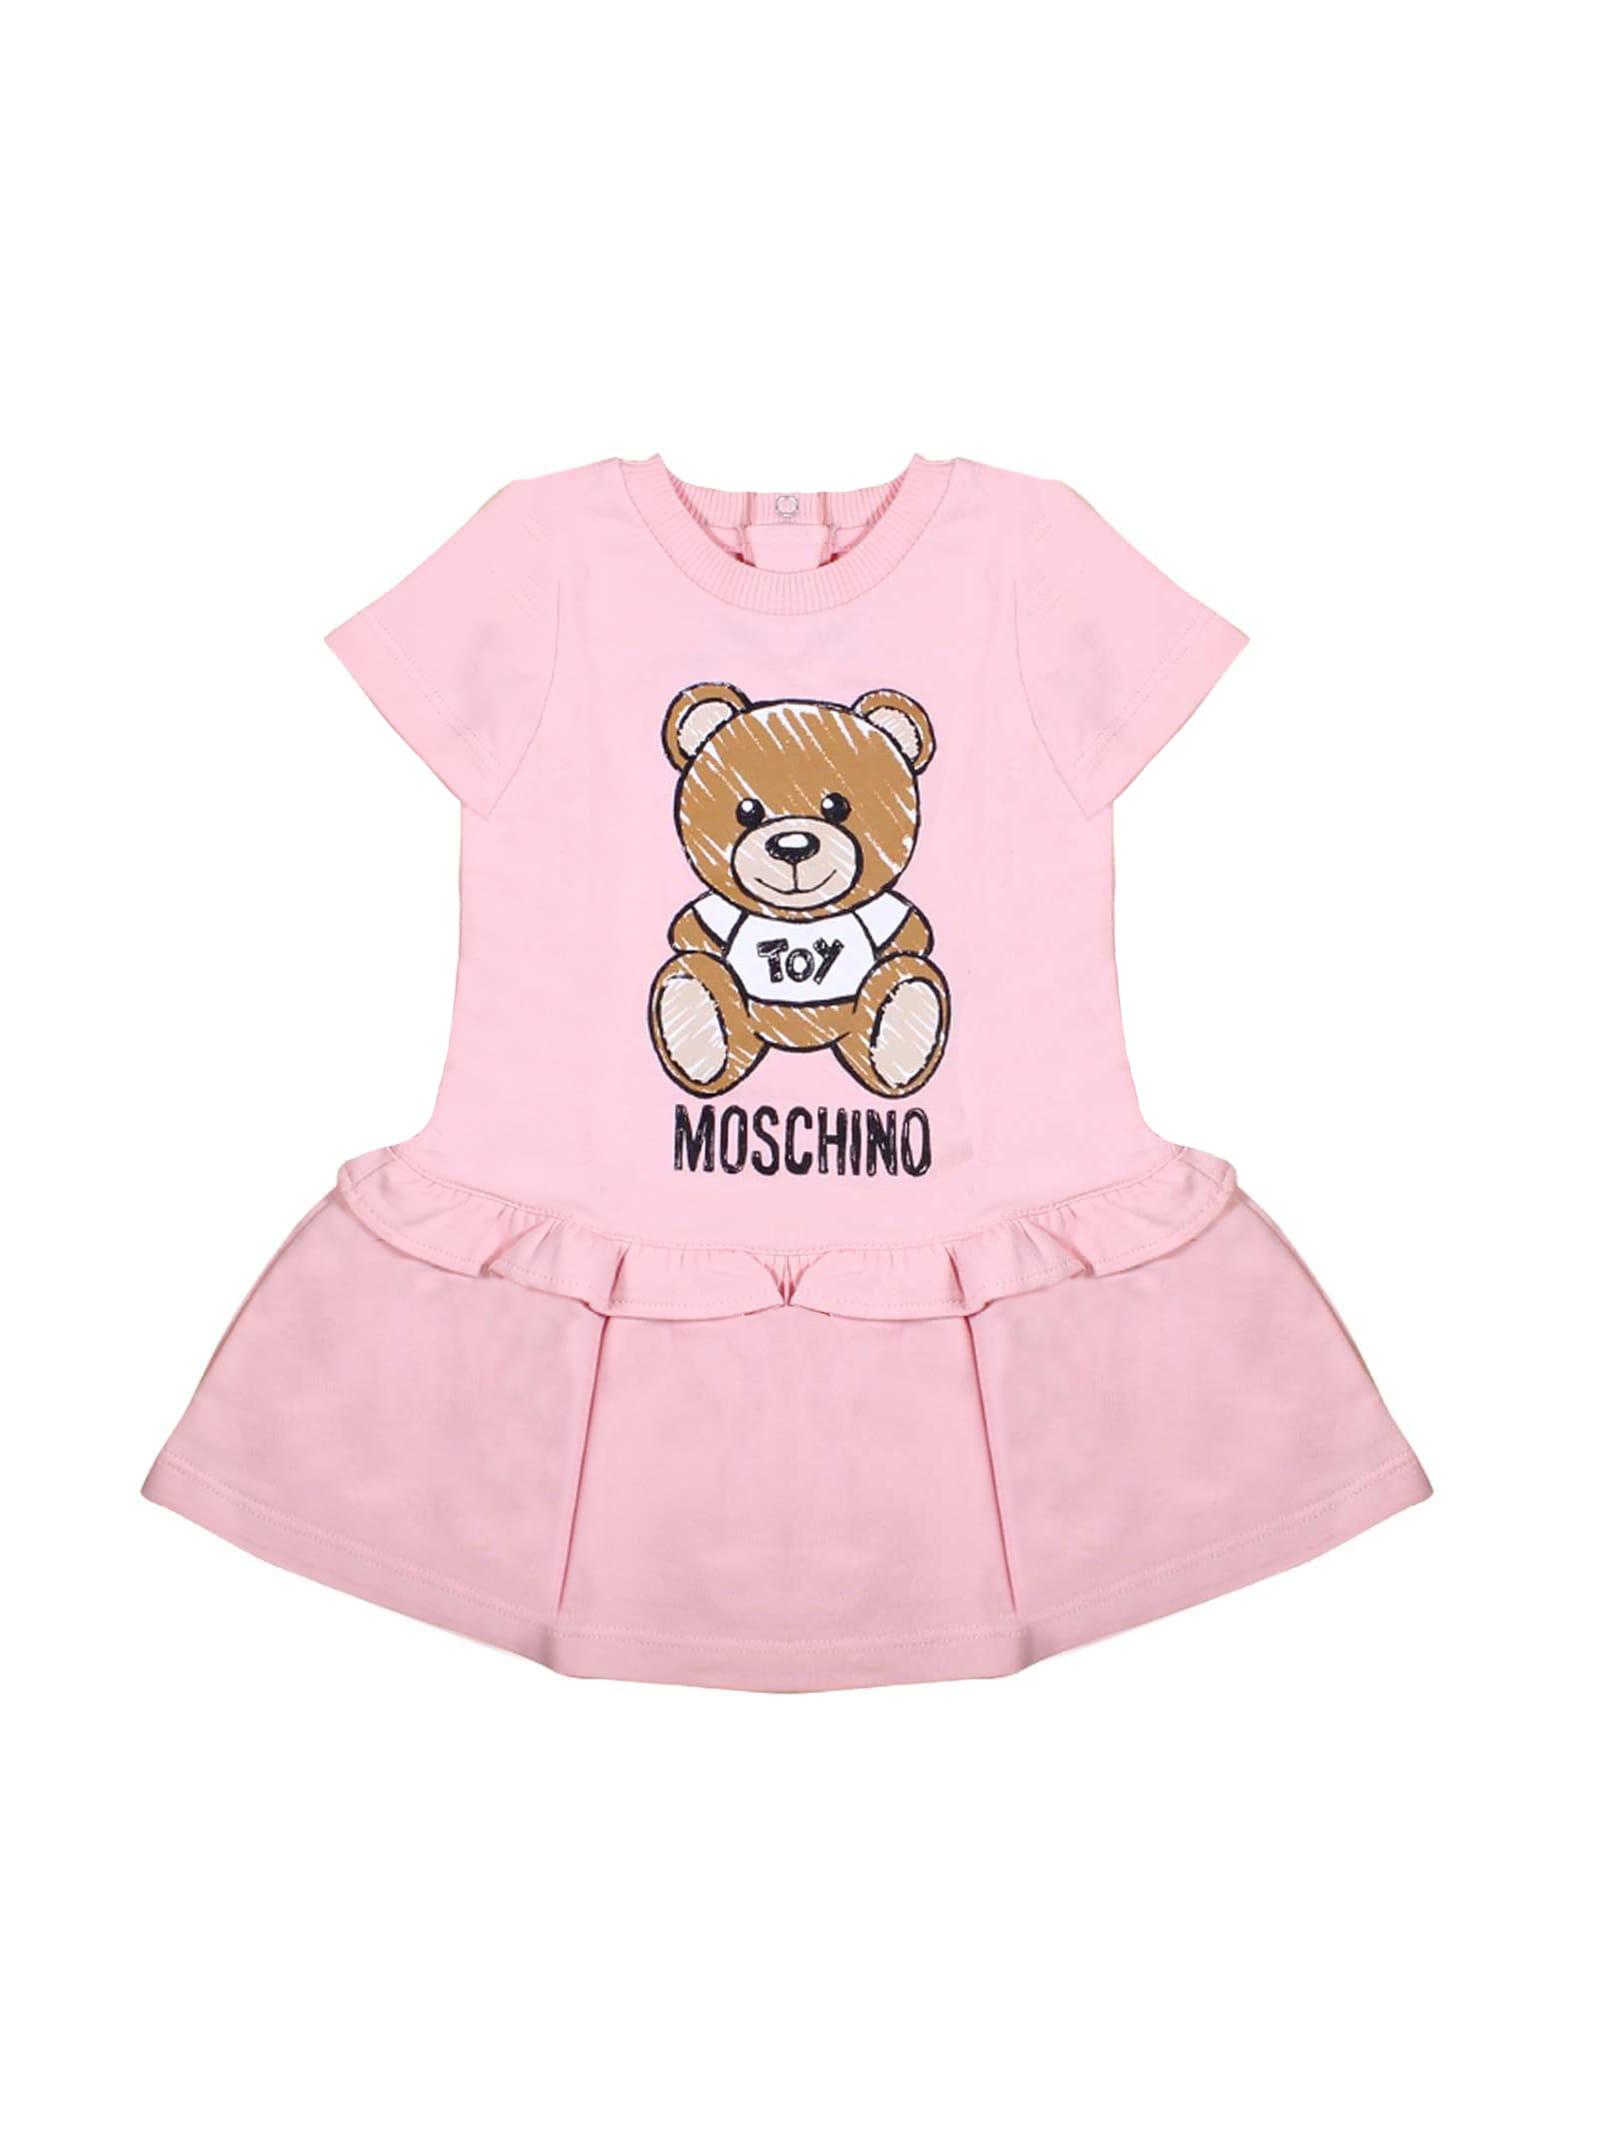 Moschino Pink Short-sleeved Dress Girl